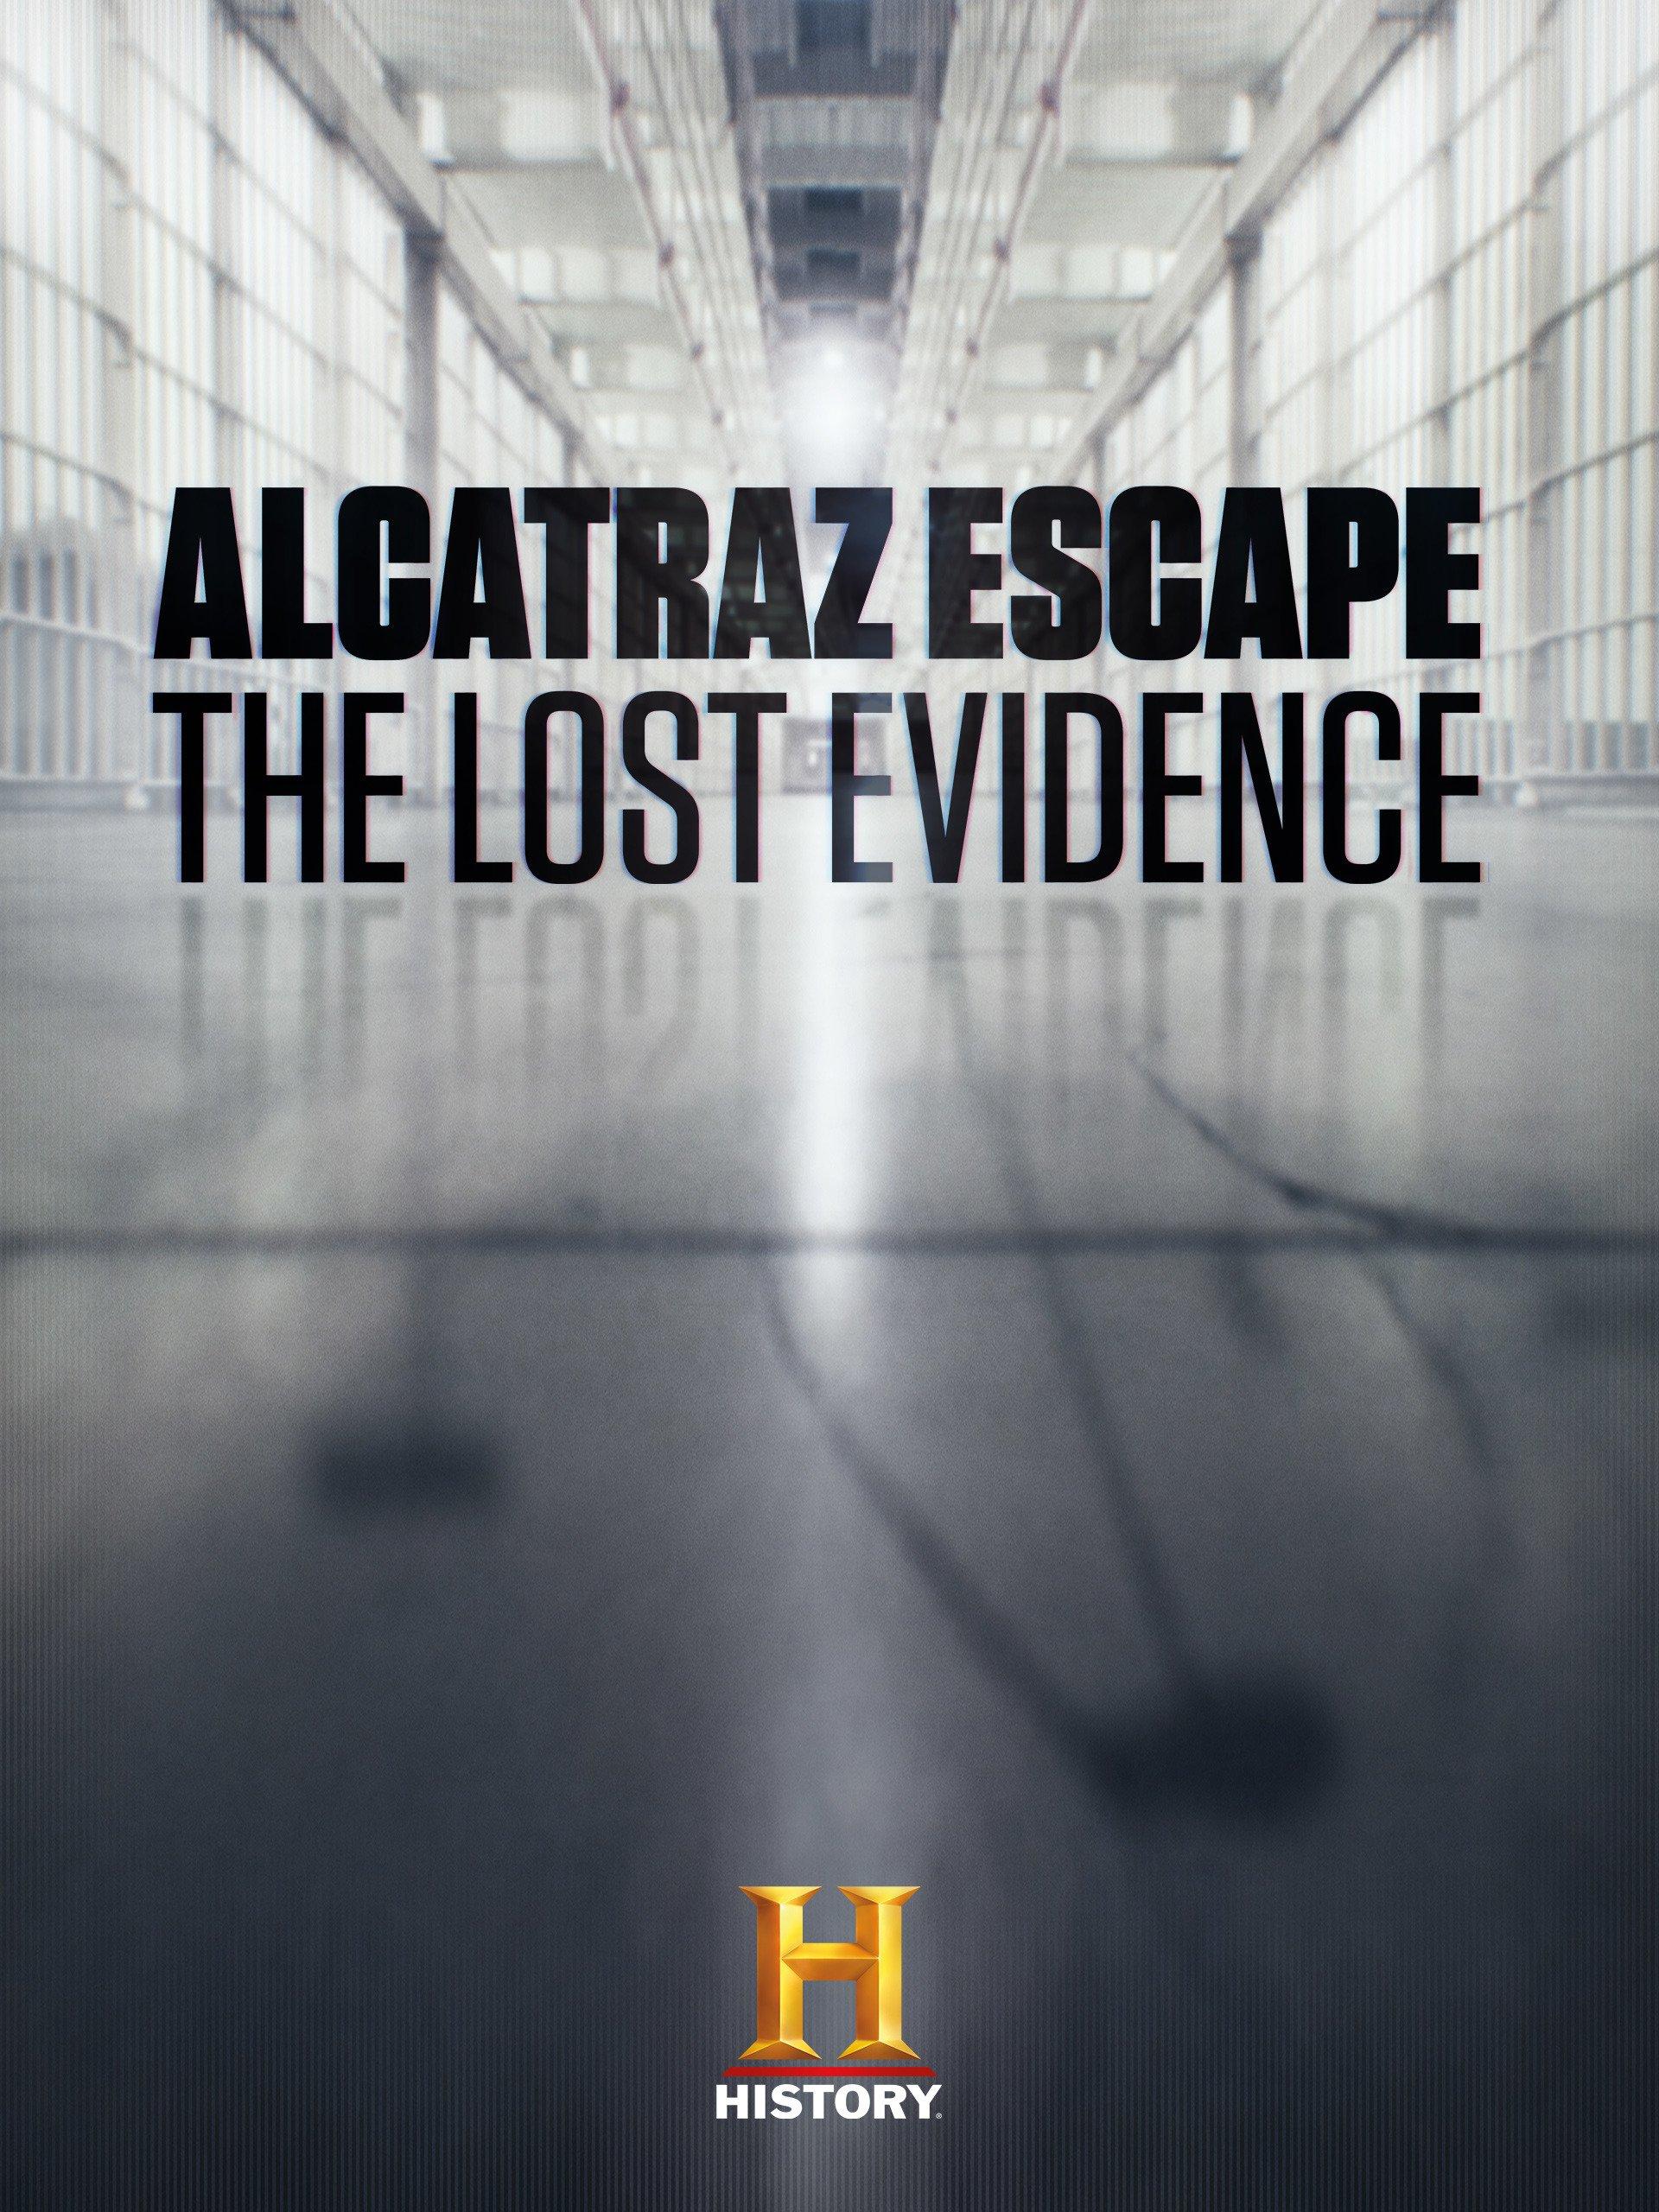 Alcatraz Escape: The Lost Evidence (TV Movie 2018) - IMDb